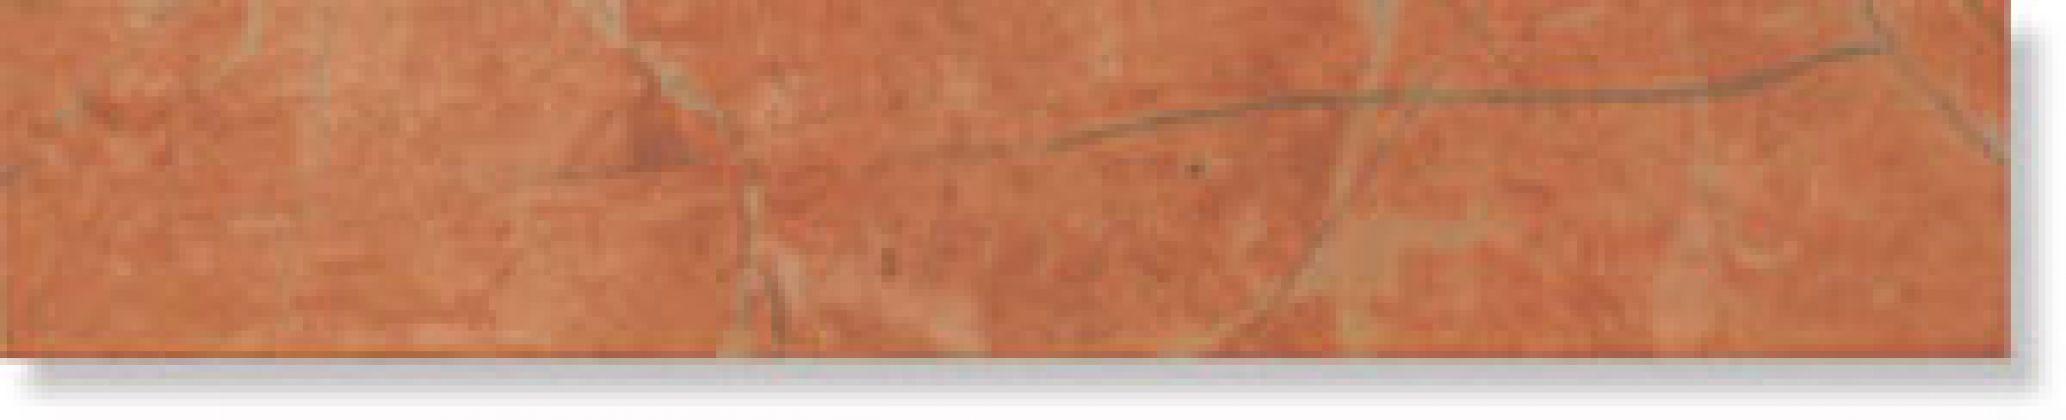 Плинтус Siam Cuero 8x45